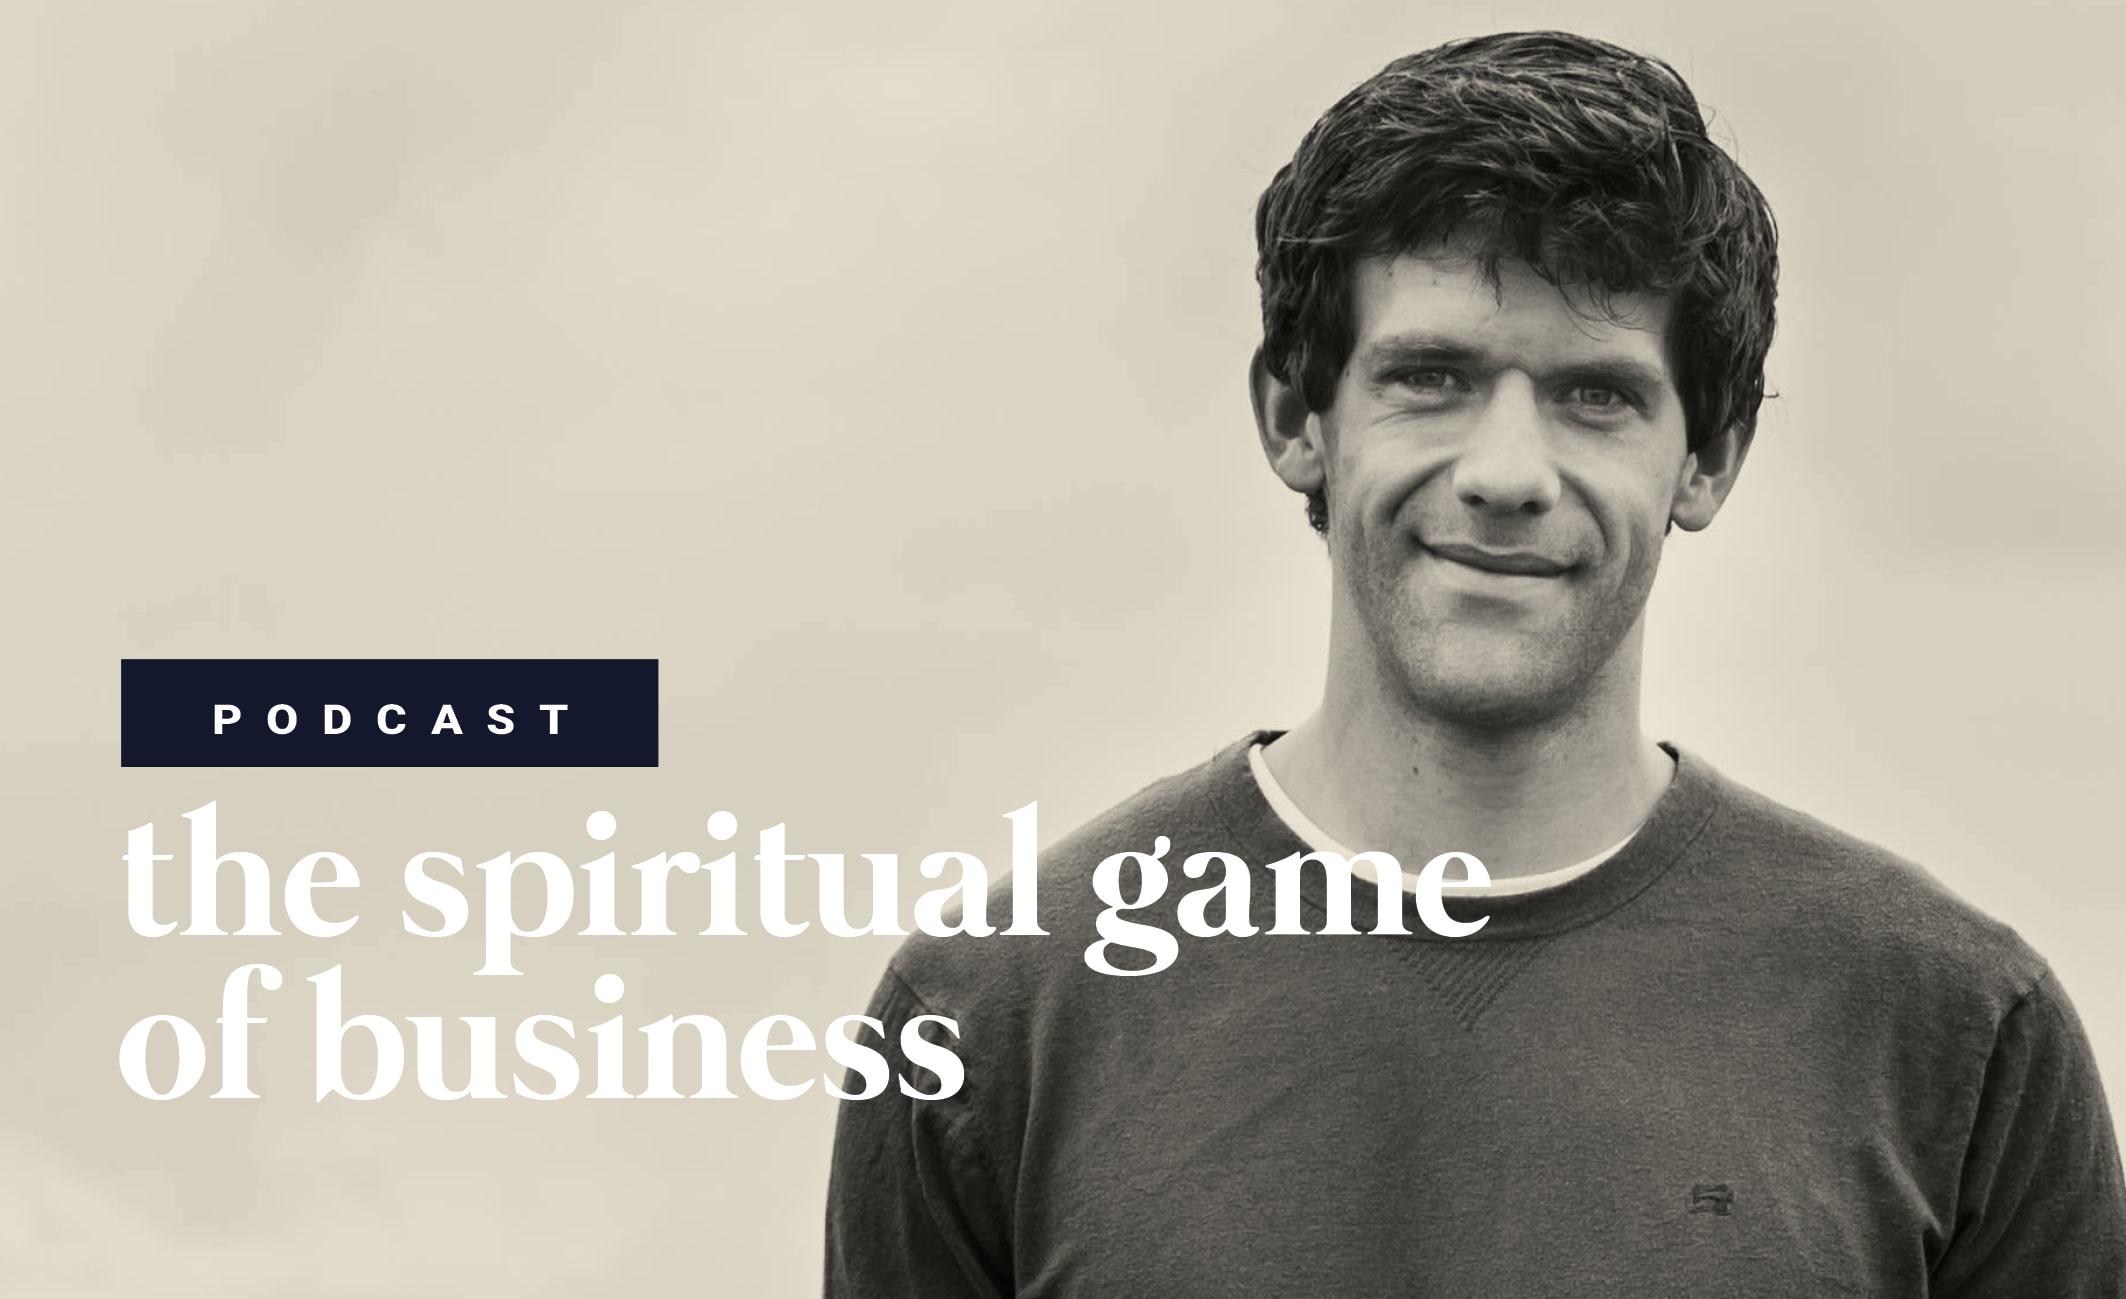 Jesse van der Velde - Are you spiritually bypassing?